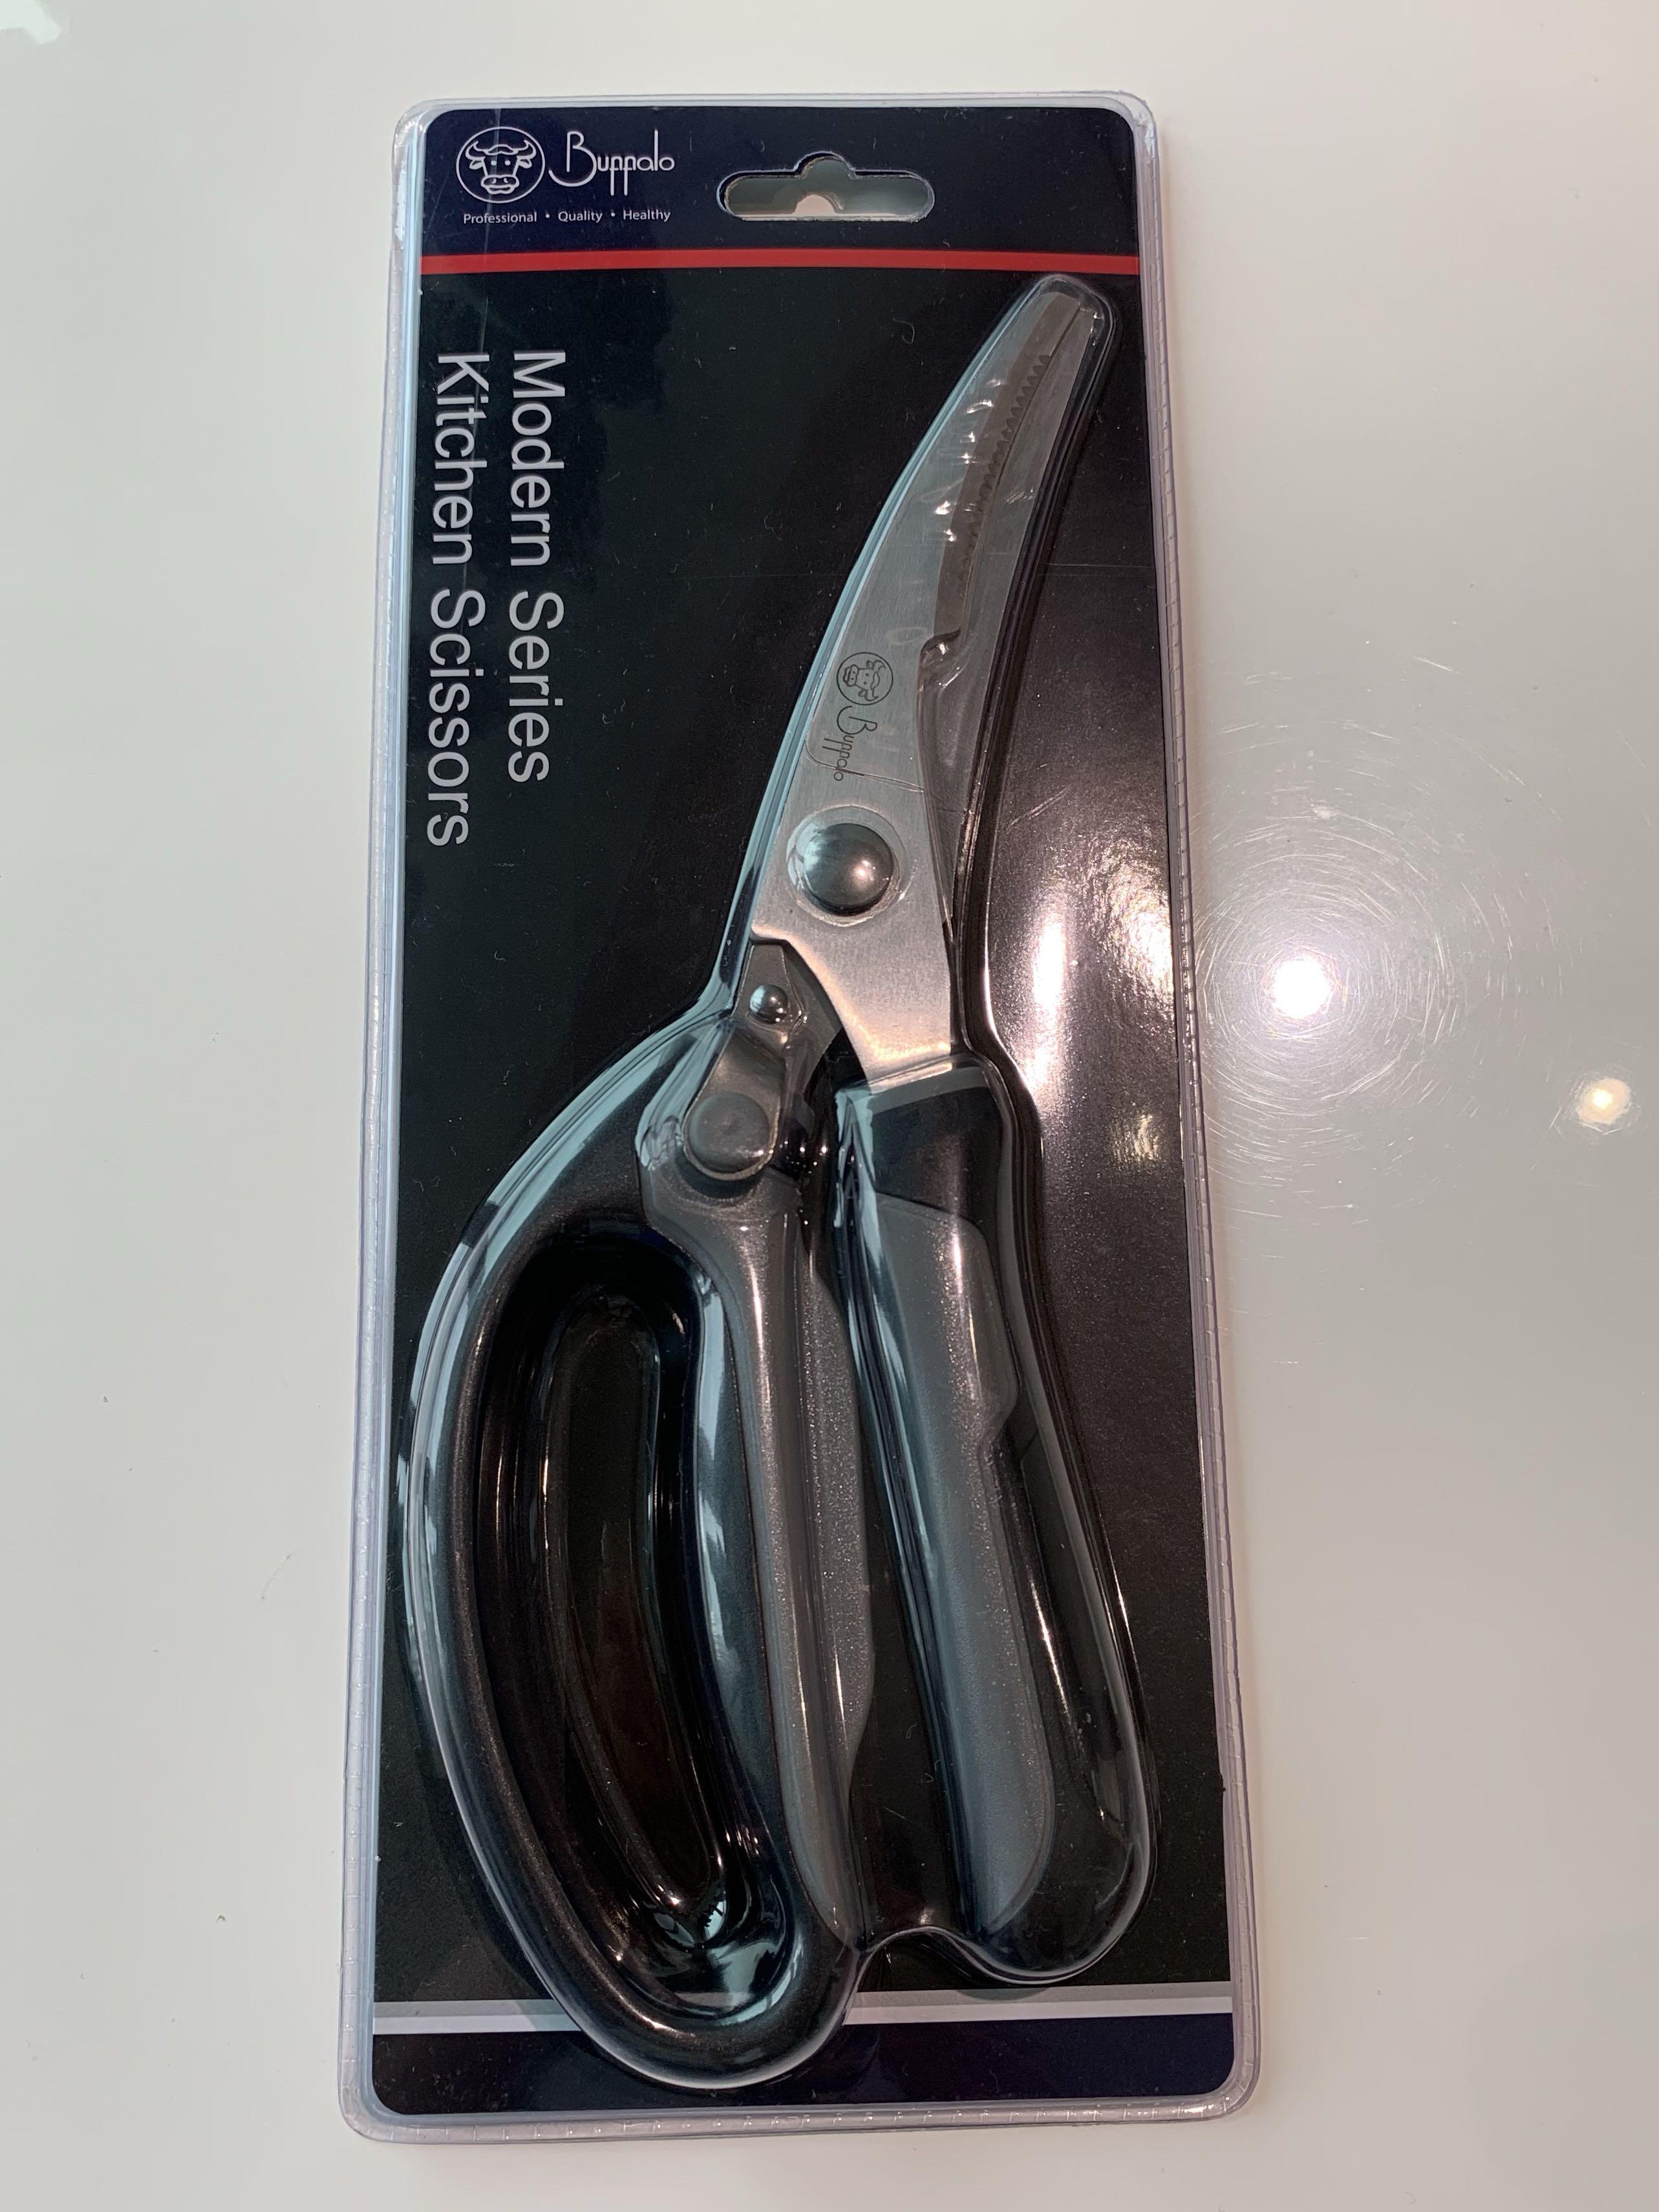 Buppalo 牛頭牌 廚房剪刀 Modern Series Kitchen Scissors